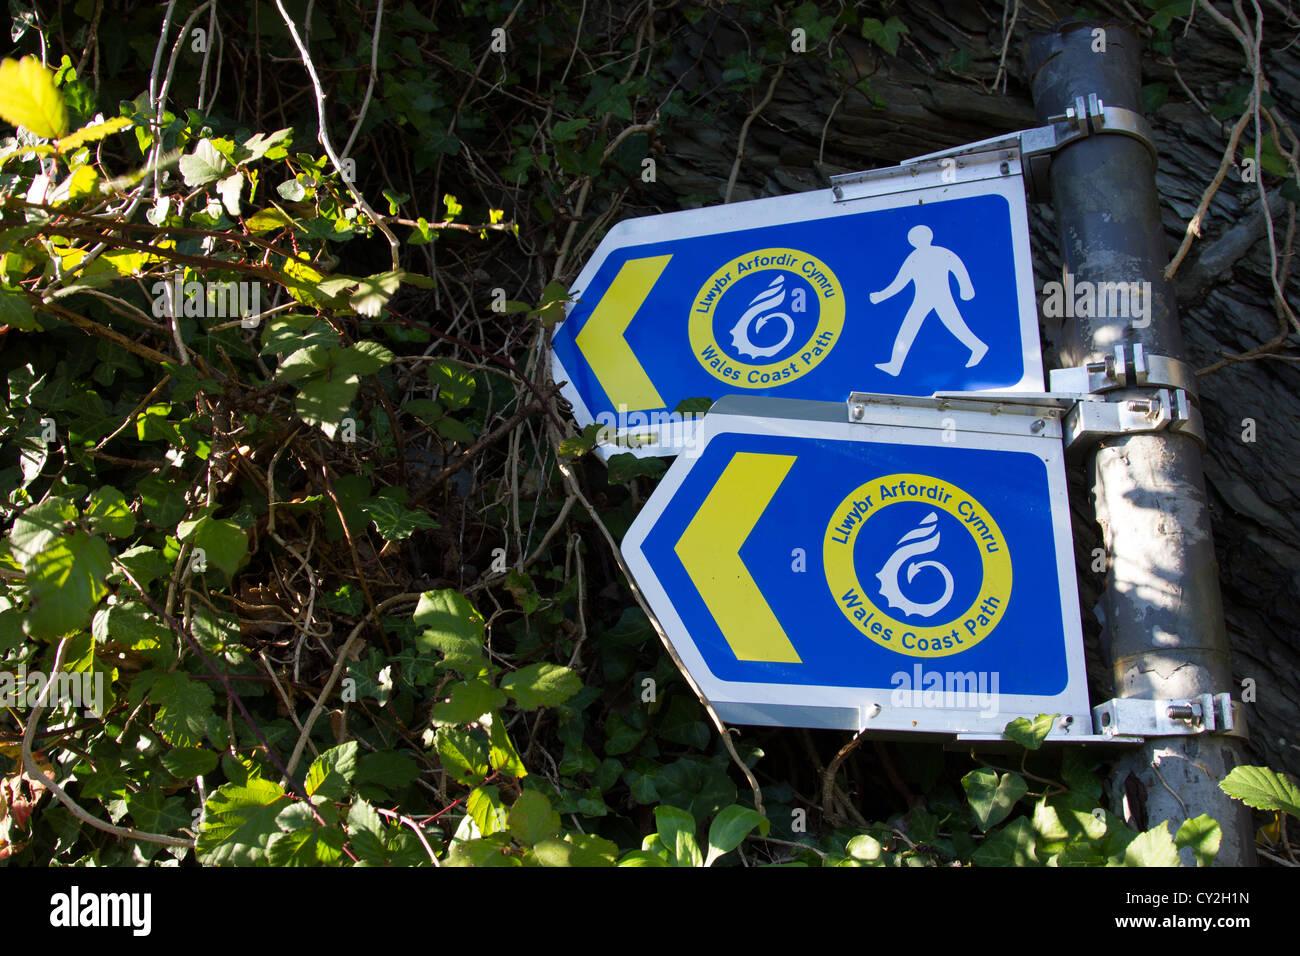 Wales coastal path signpost - Stock Image